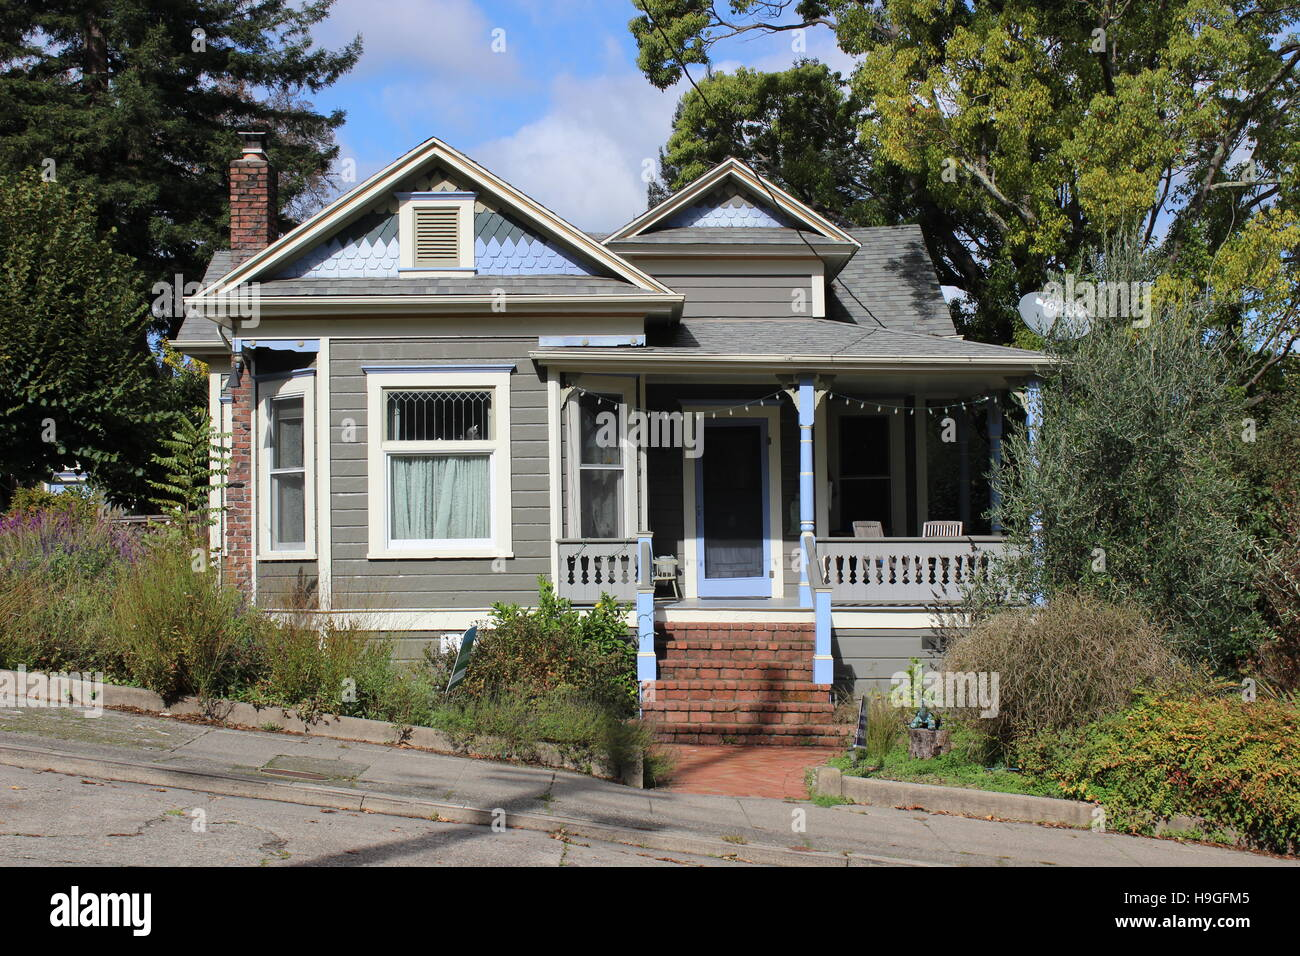 Queen Anne Cottage, Sevastopol, Calkifornia - Stock Image